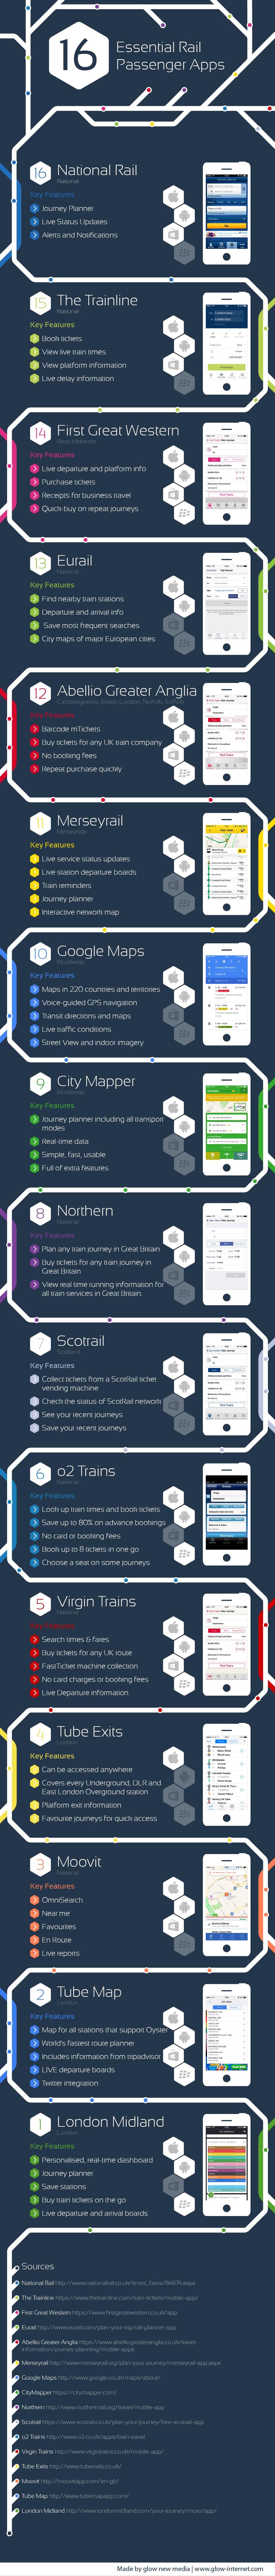 16 Essential Rail Passenger Mobile Apps